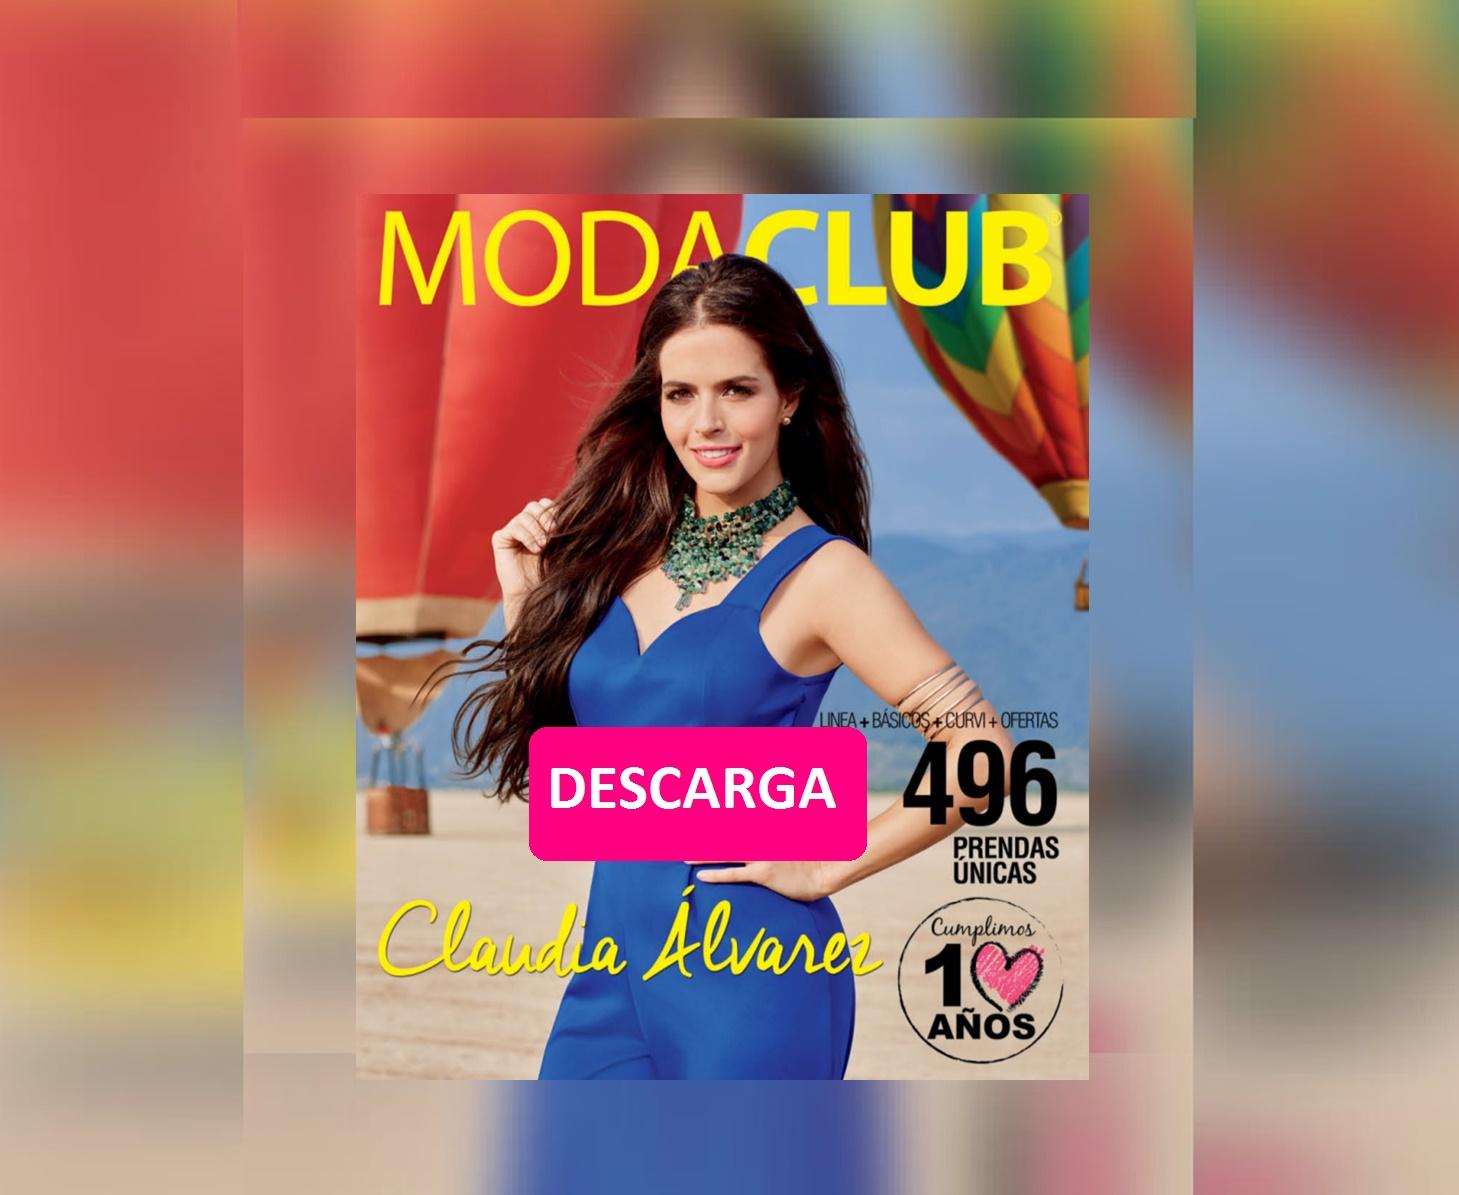 moda club catalogo 2016